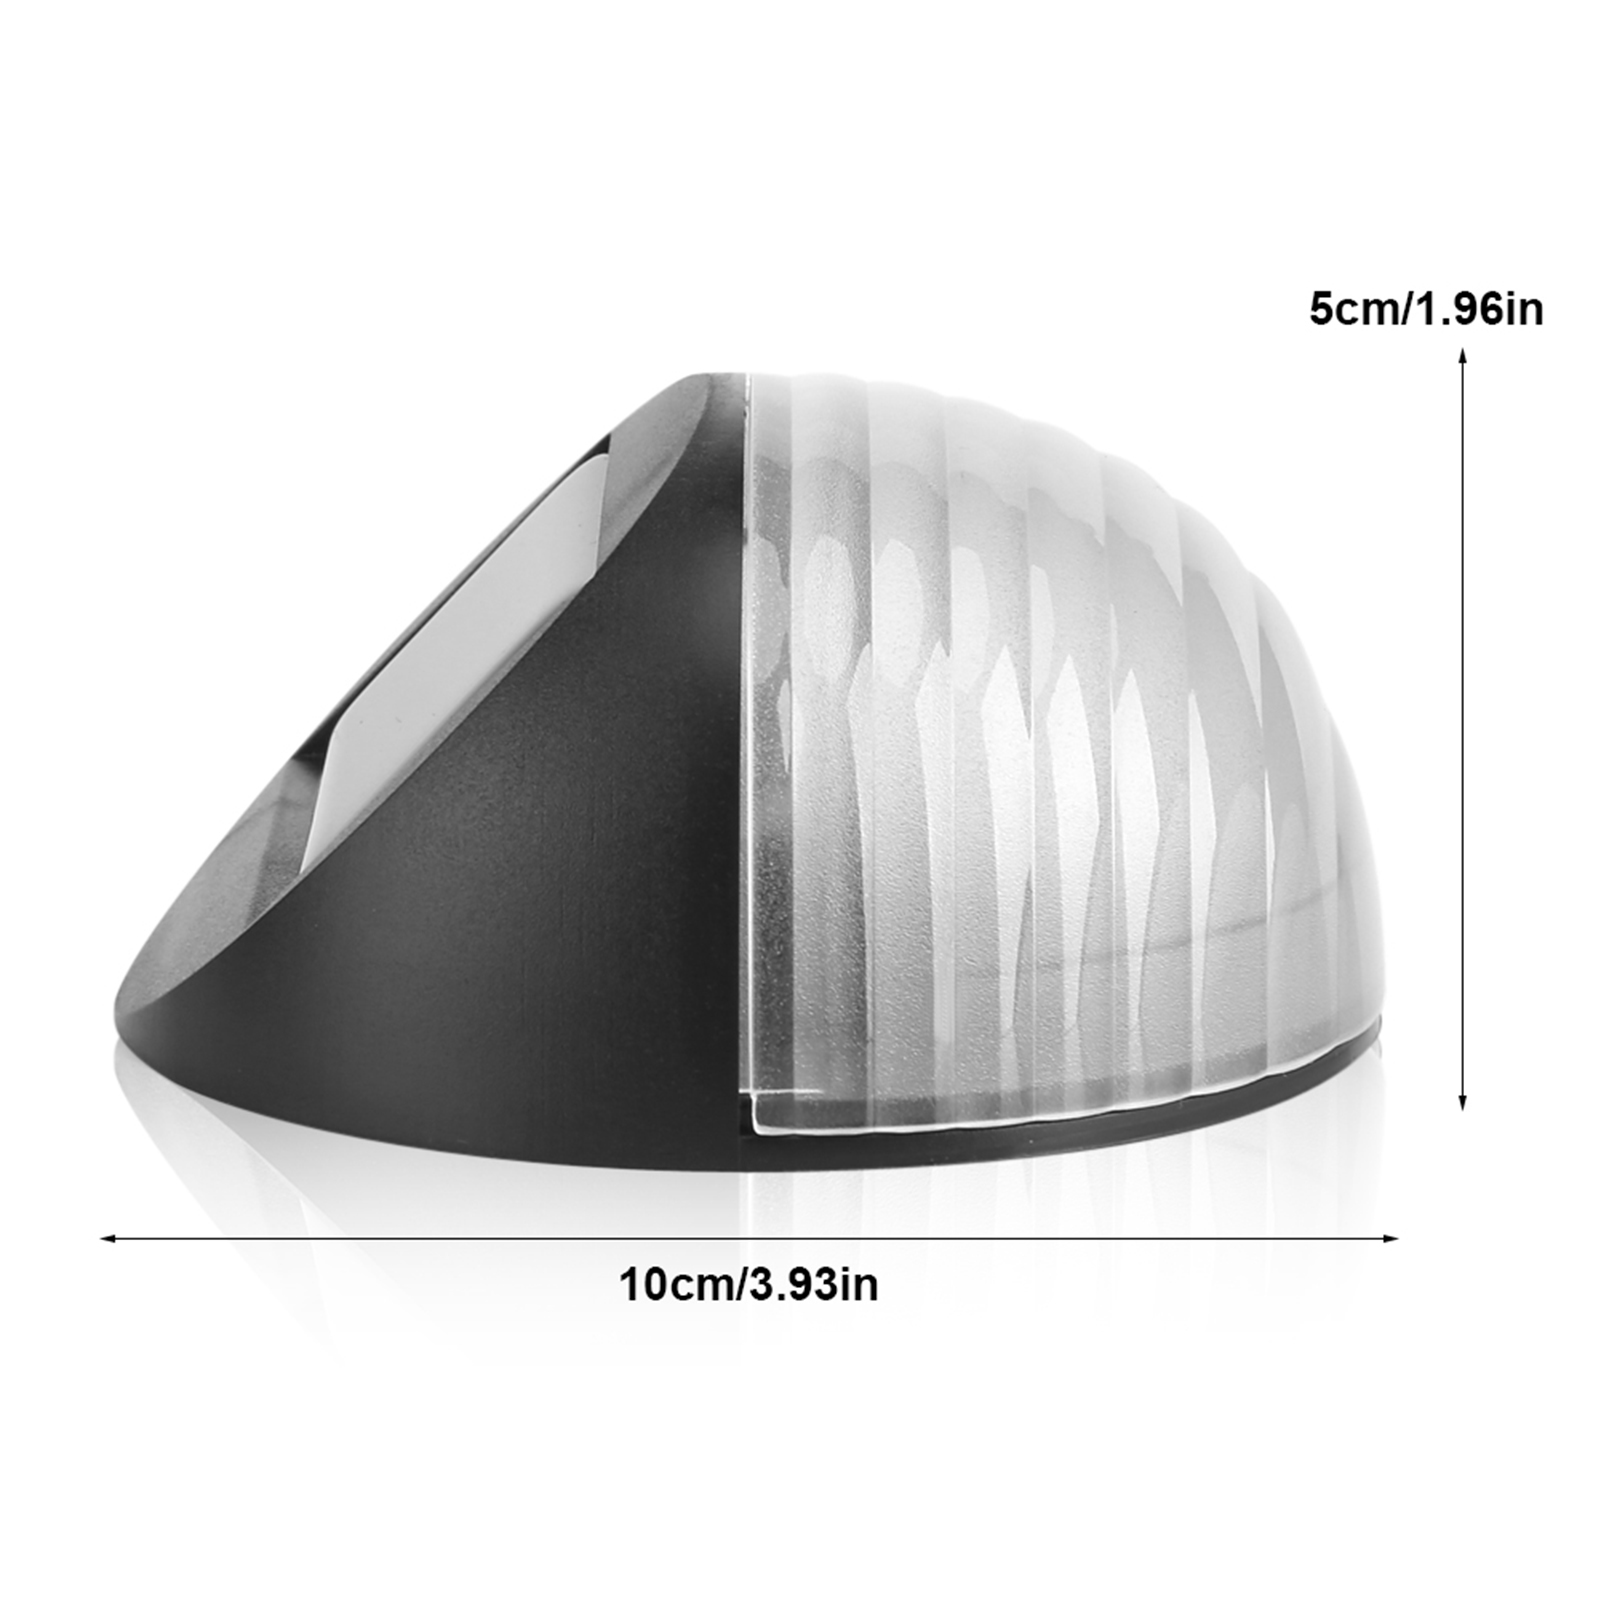 solarleuchte wasserfest 6 led gartenleuchte solar au enleuchte wand birnen lampe ebay. Black Bedroom Furniture Sets. Home Design Ideas